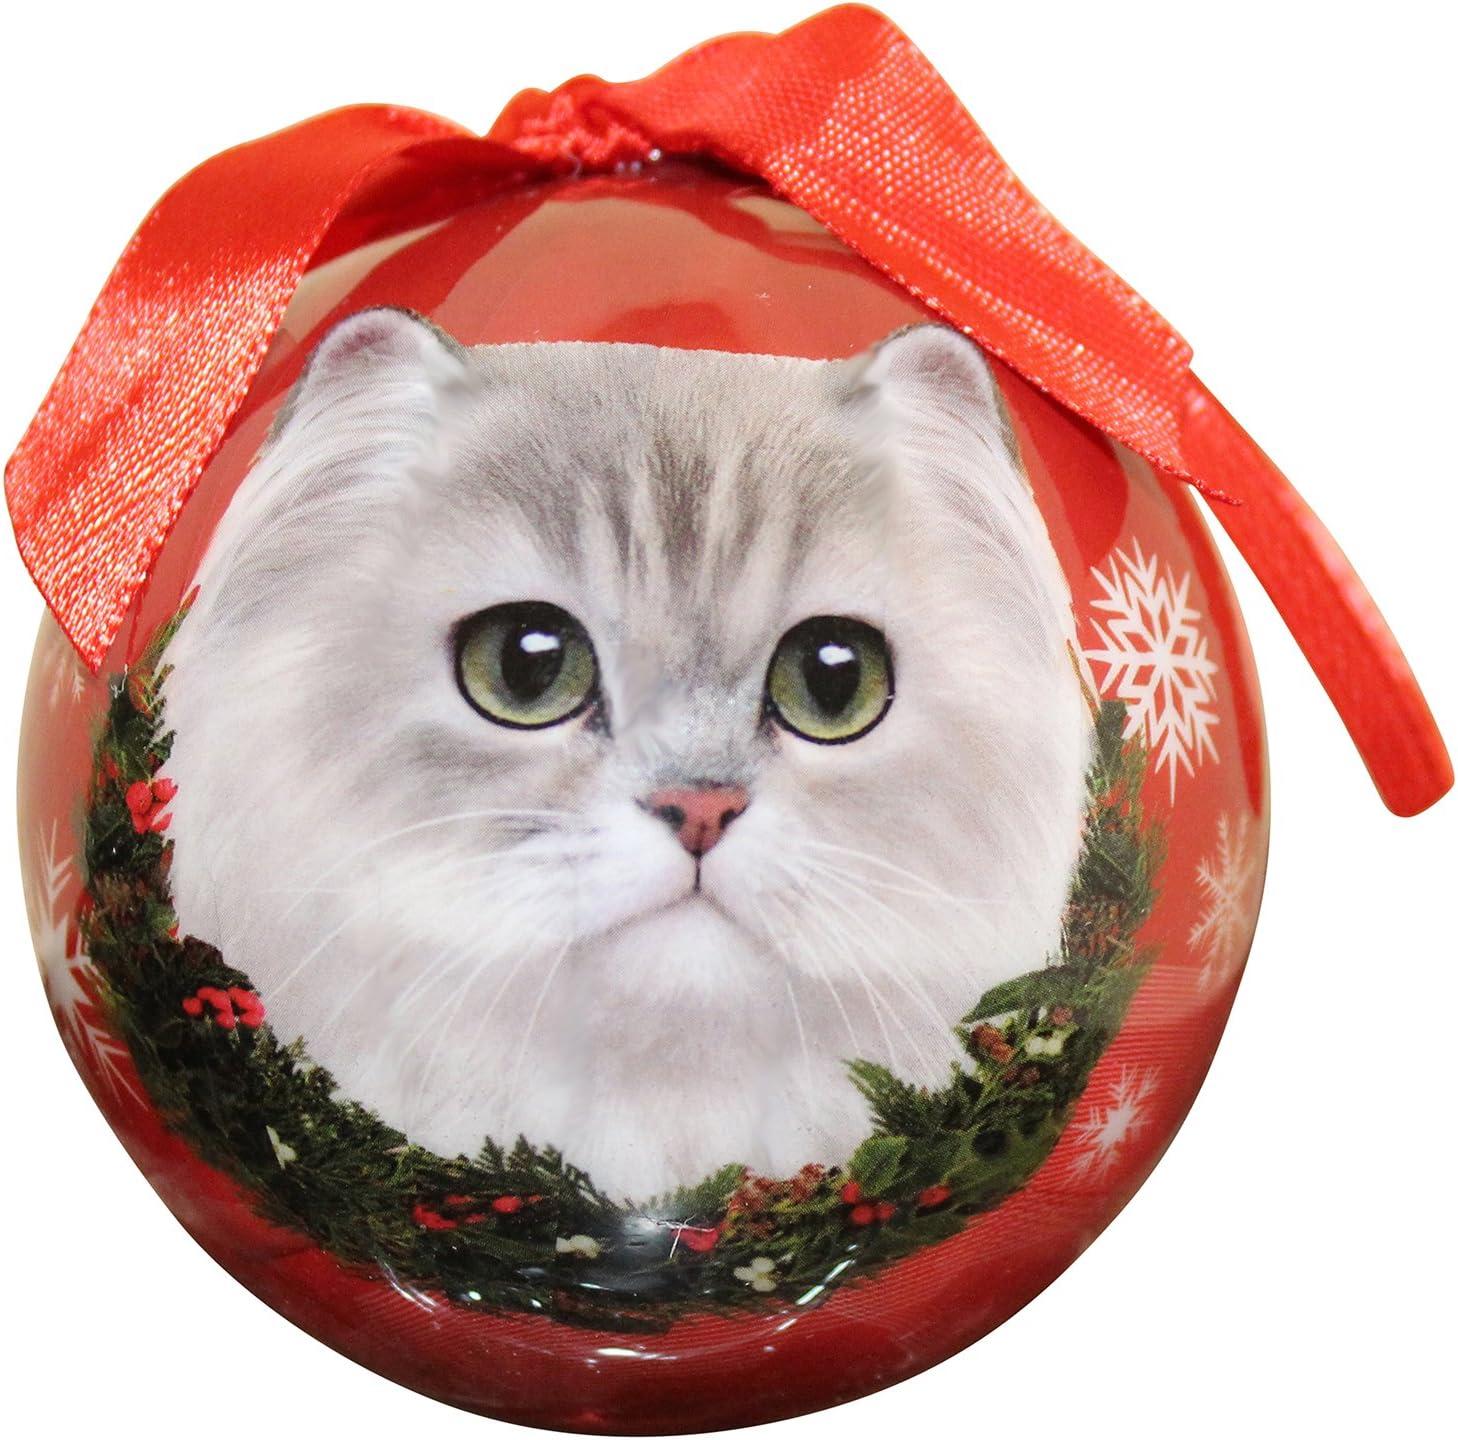 HIMALAYAN CAT CHRISTMAS BALL ORNAMENT HOLIDAY XMAS PET LOVERS GIFT